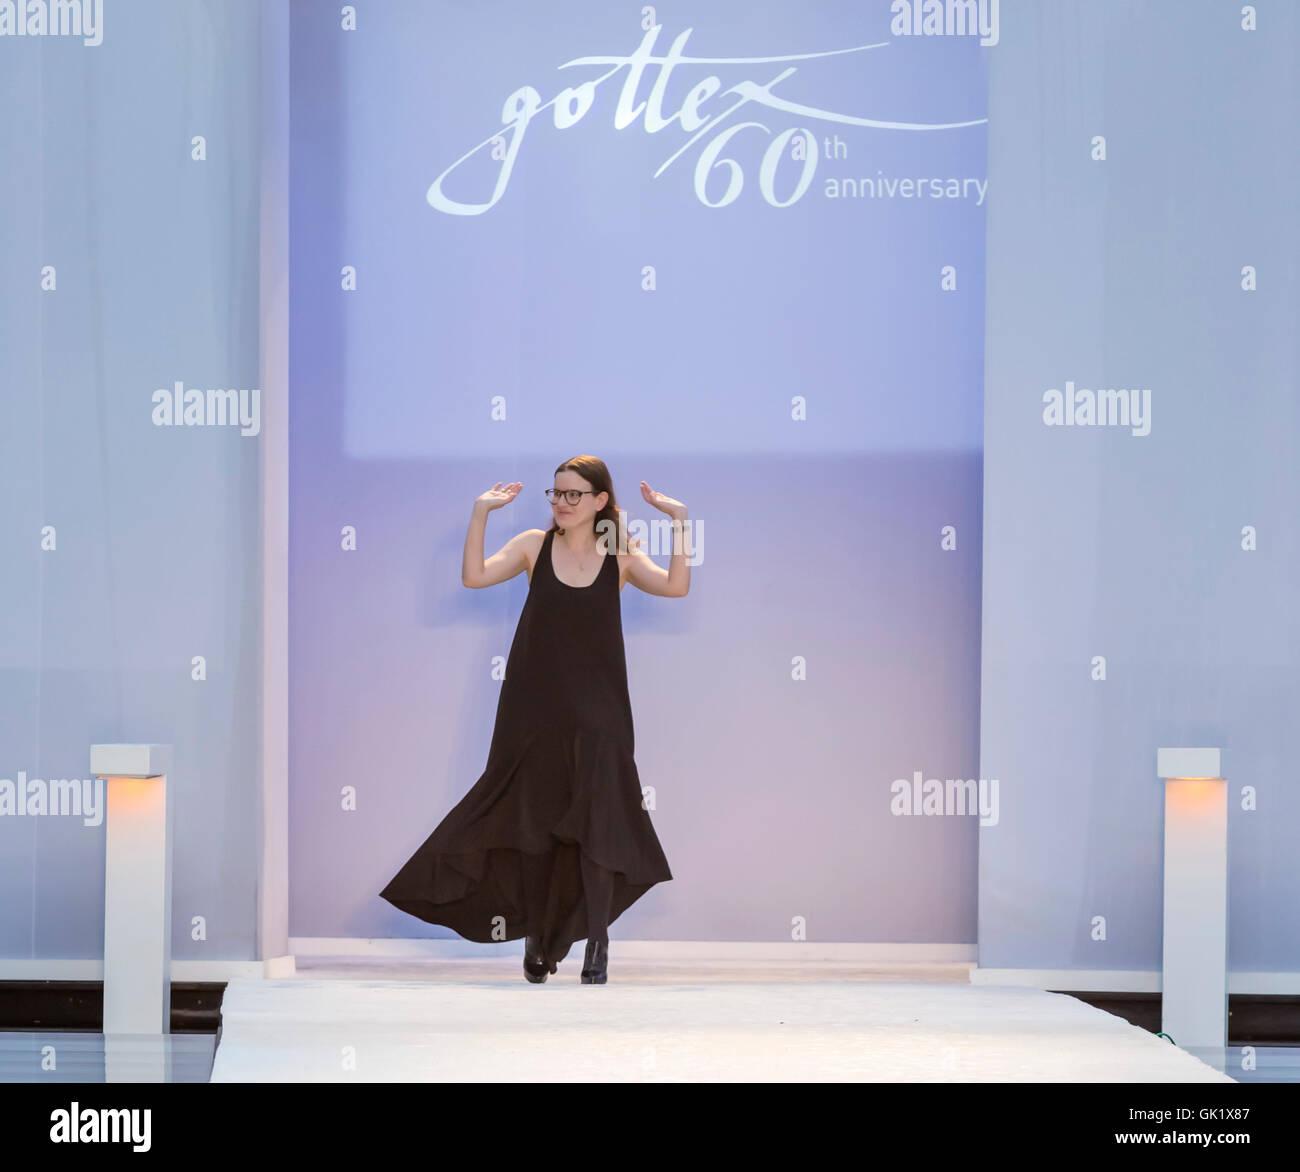 MIAMI BEACH, FL - JULY 16, 2016: Designer Karen Gasner walks the runway wearing Gottex 2017 Collection at SwimMiami - Stock Image